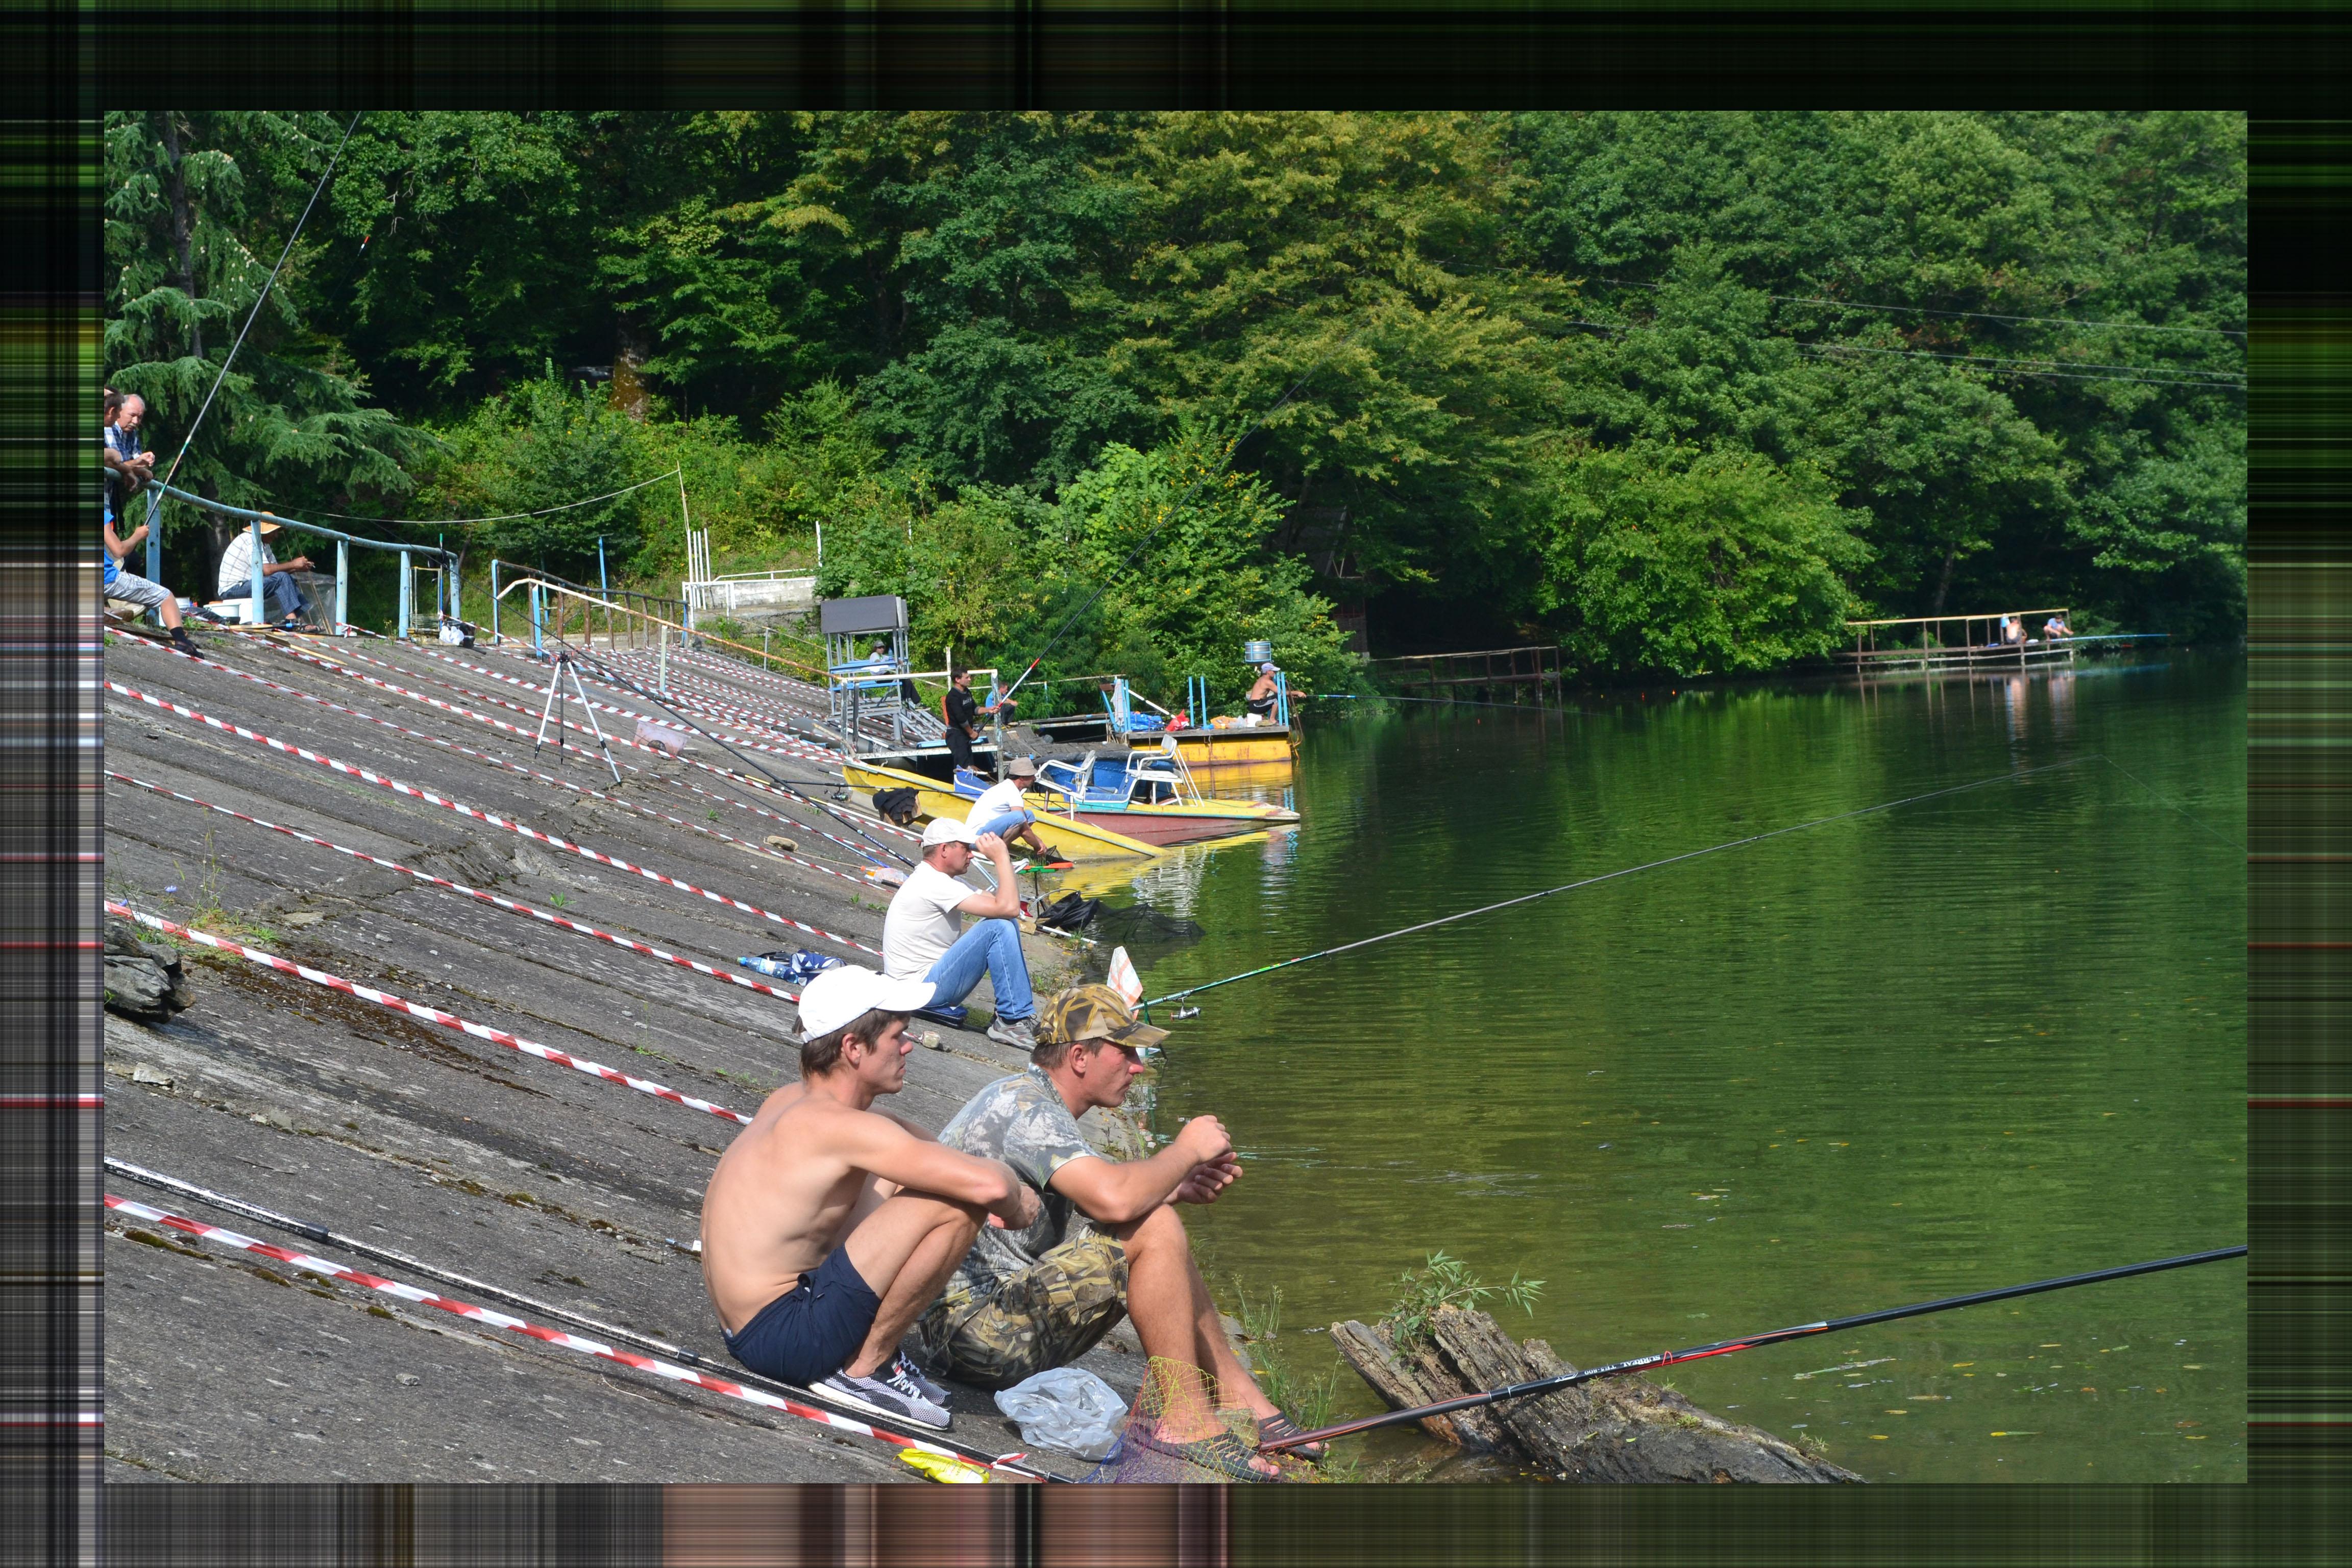 озеро, рыбалка, адлер